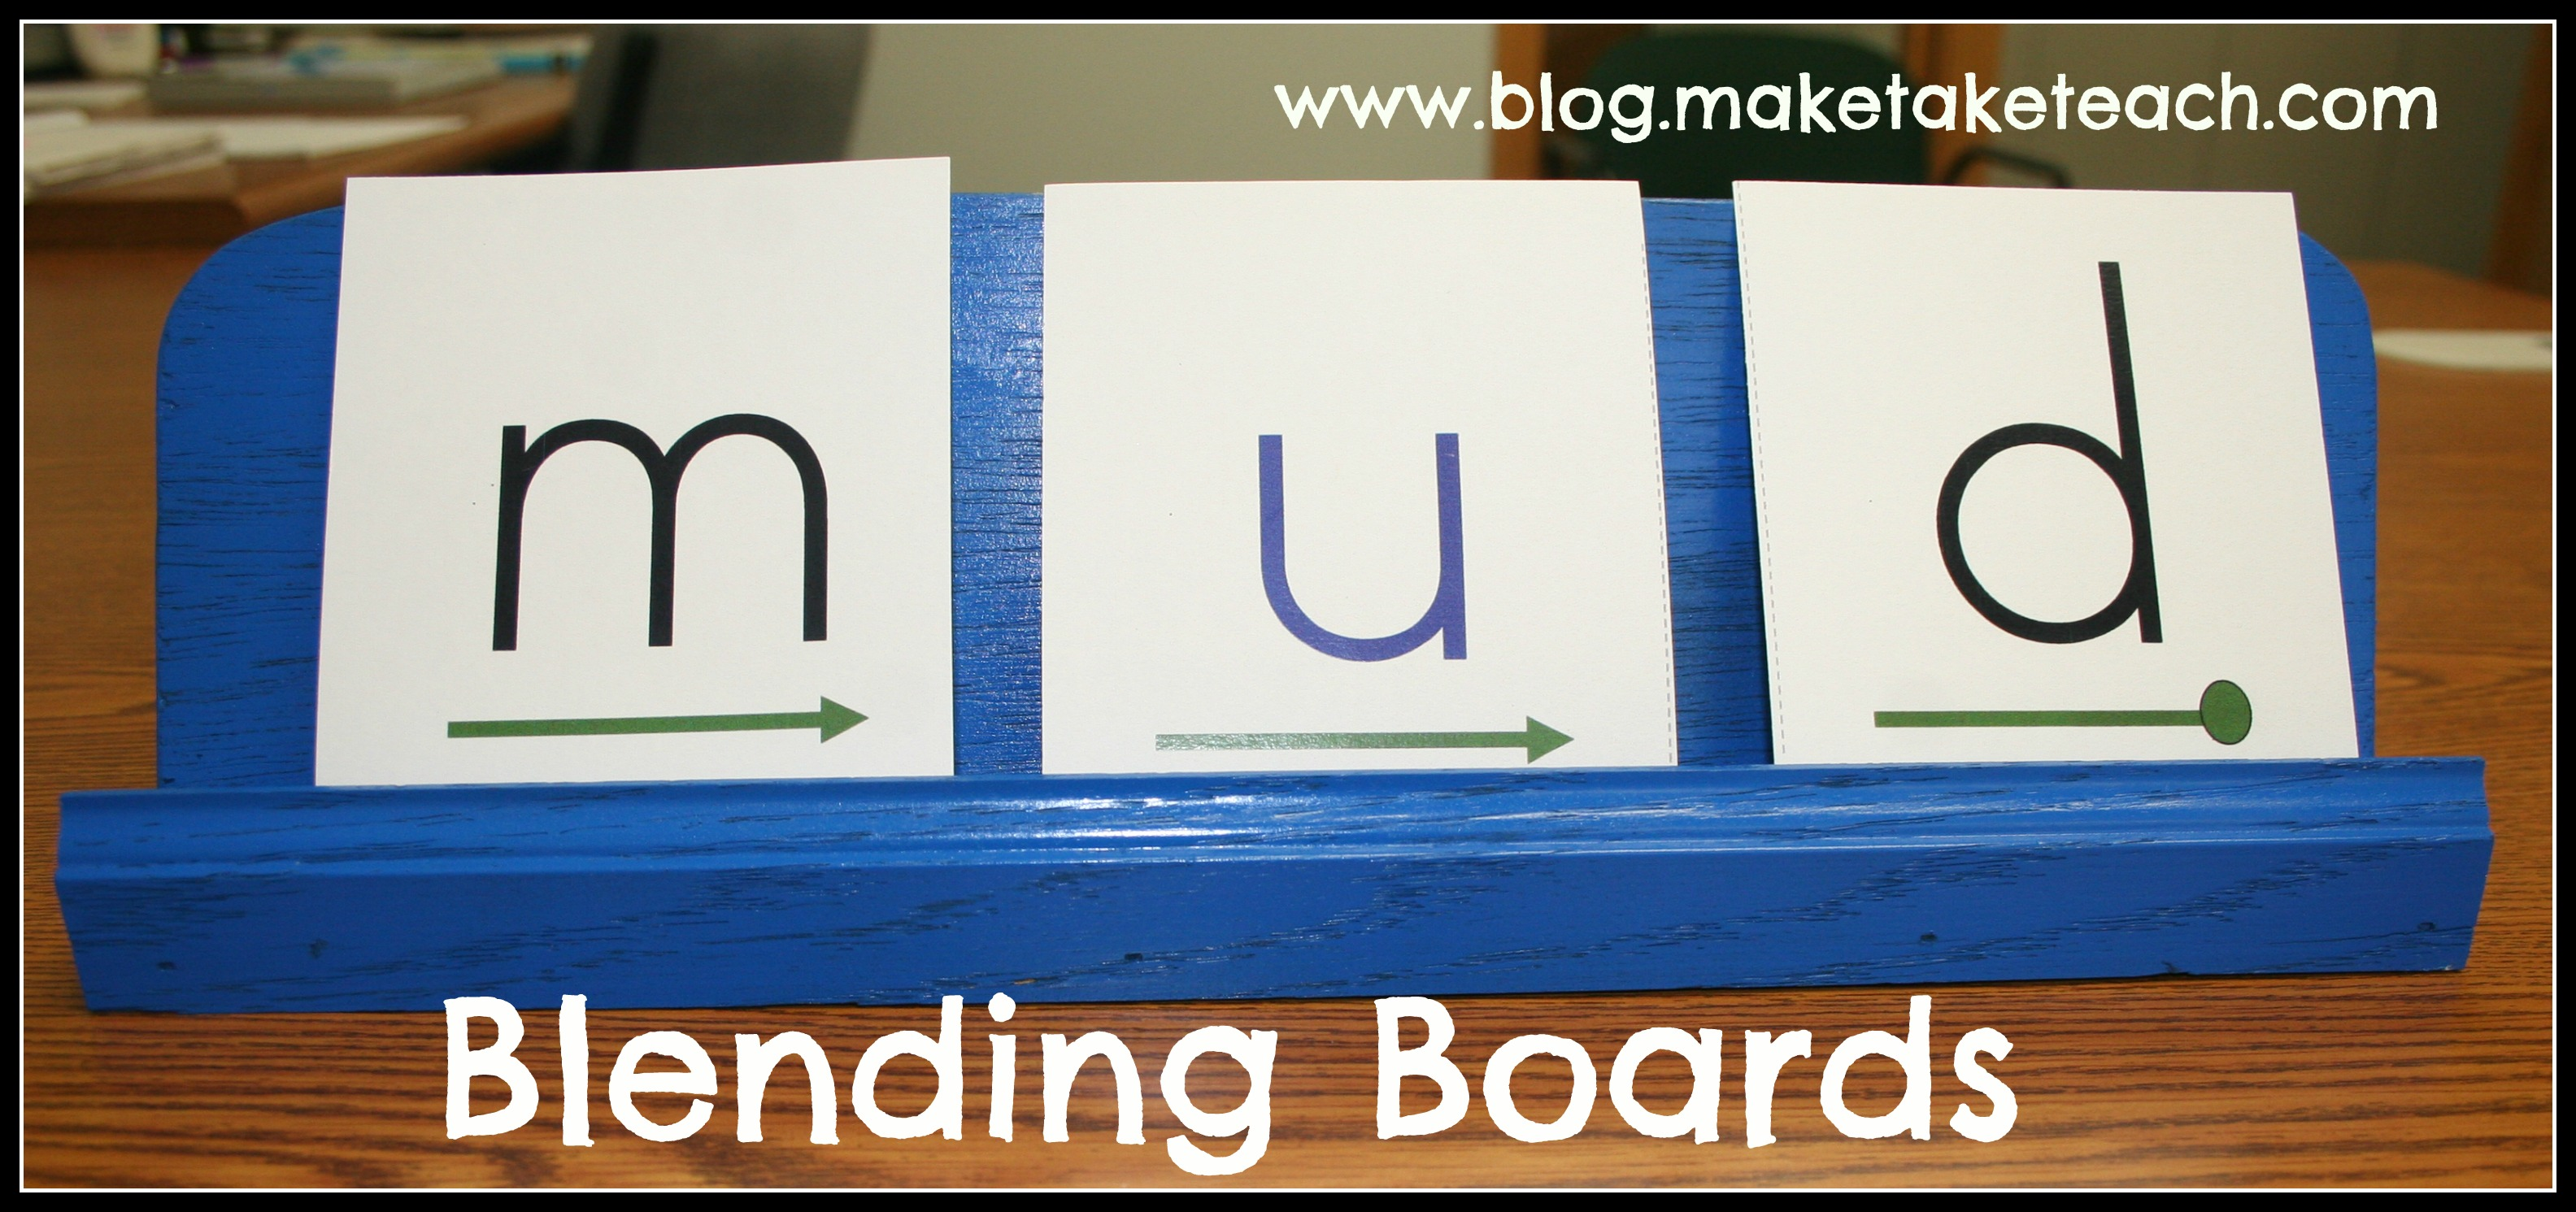 Blendingboardblog